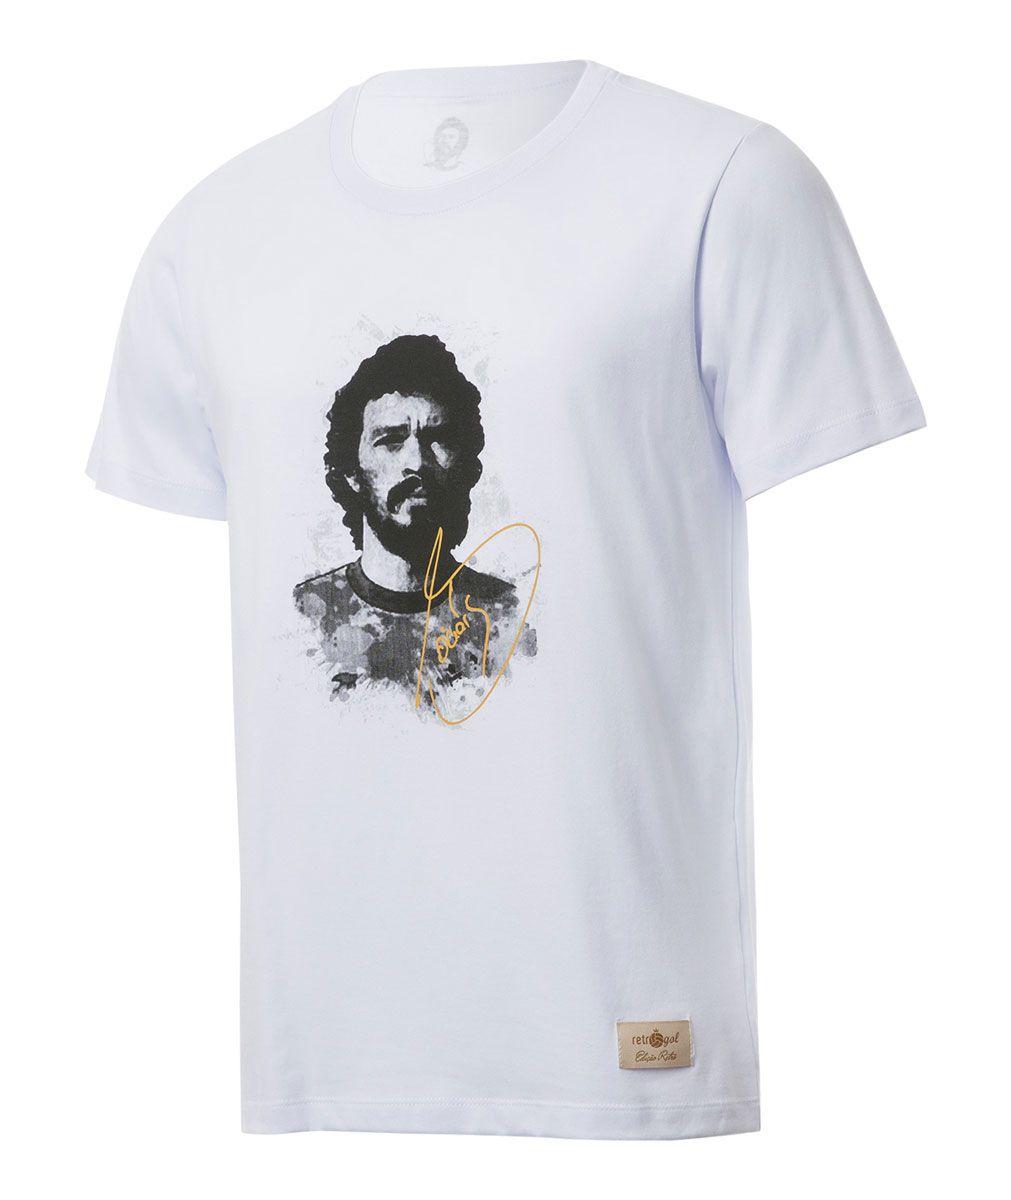 Camisa Retrô Gol Sócrates Ex - Corinthians Rosto Branca Torcedor